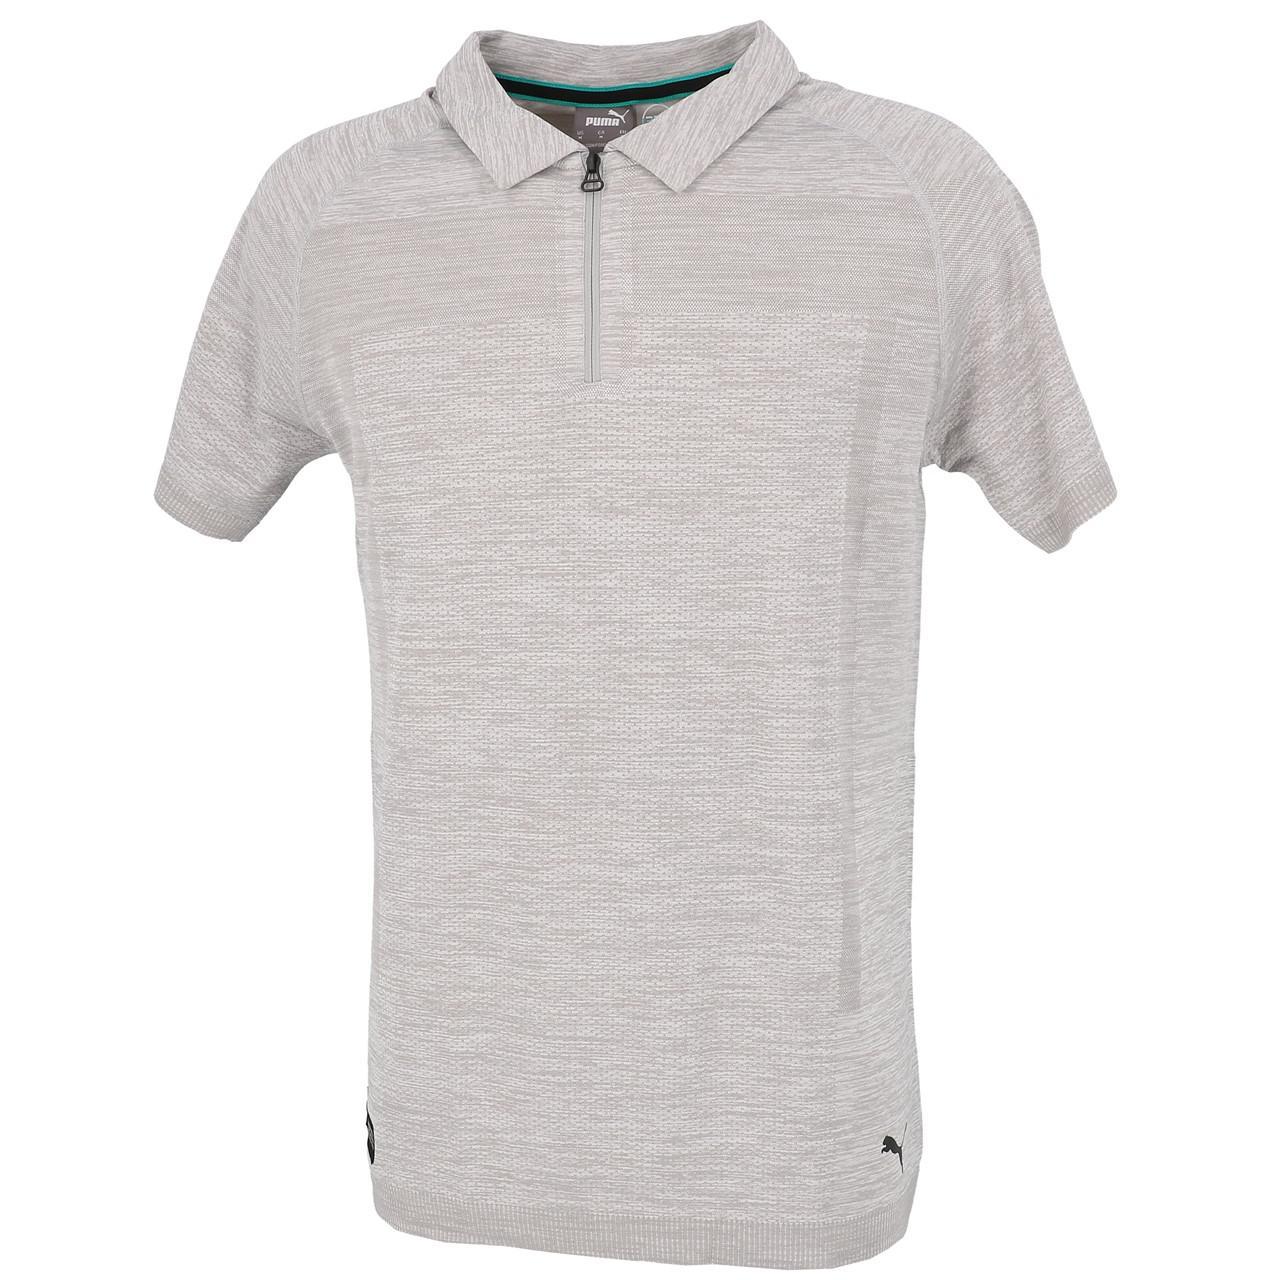 Short-Sleeve-Polo-Puma-Mapm-Rct-Evoknit-Groups-Polo-Grey-30141-New